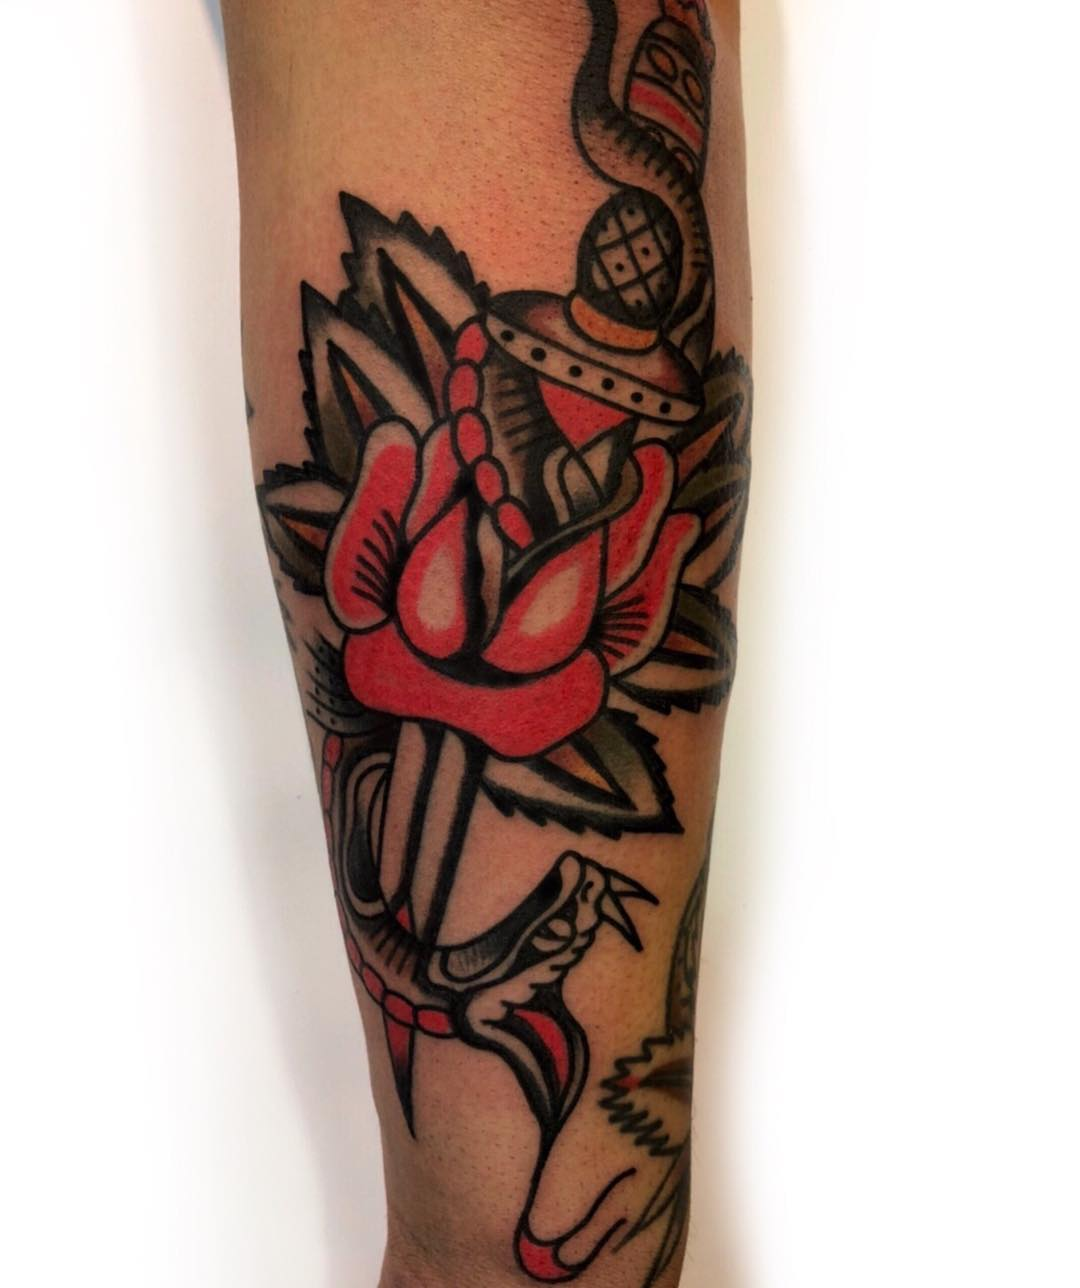 traditionaltattoos,followforfollow,followmeciudadreal,ciudadreal,tomelloso,almagro,puertollano,tatuajesenpuertollano,tatuajesendaimiel,ciudadrealtattoo,ciudadrealtatuajes,tatuajesciudadreal,follow,ciudadrealtatuajes,puertollano,ciudadreal,tattoos,ciudadrealtattoo,tattooers,besttattooers,juantabasco,ciudadrealsetatua,ink,tatuajes,realismo,realistictattoo,ciudadrealtattoo,tatuajesenpuertollano,traditionaltattoos,castillalamancha,ink,tattooart,thebestspaintattooartists,maxonmotortattoo,erasmusciudadreal